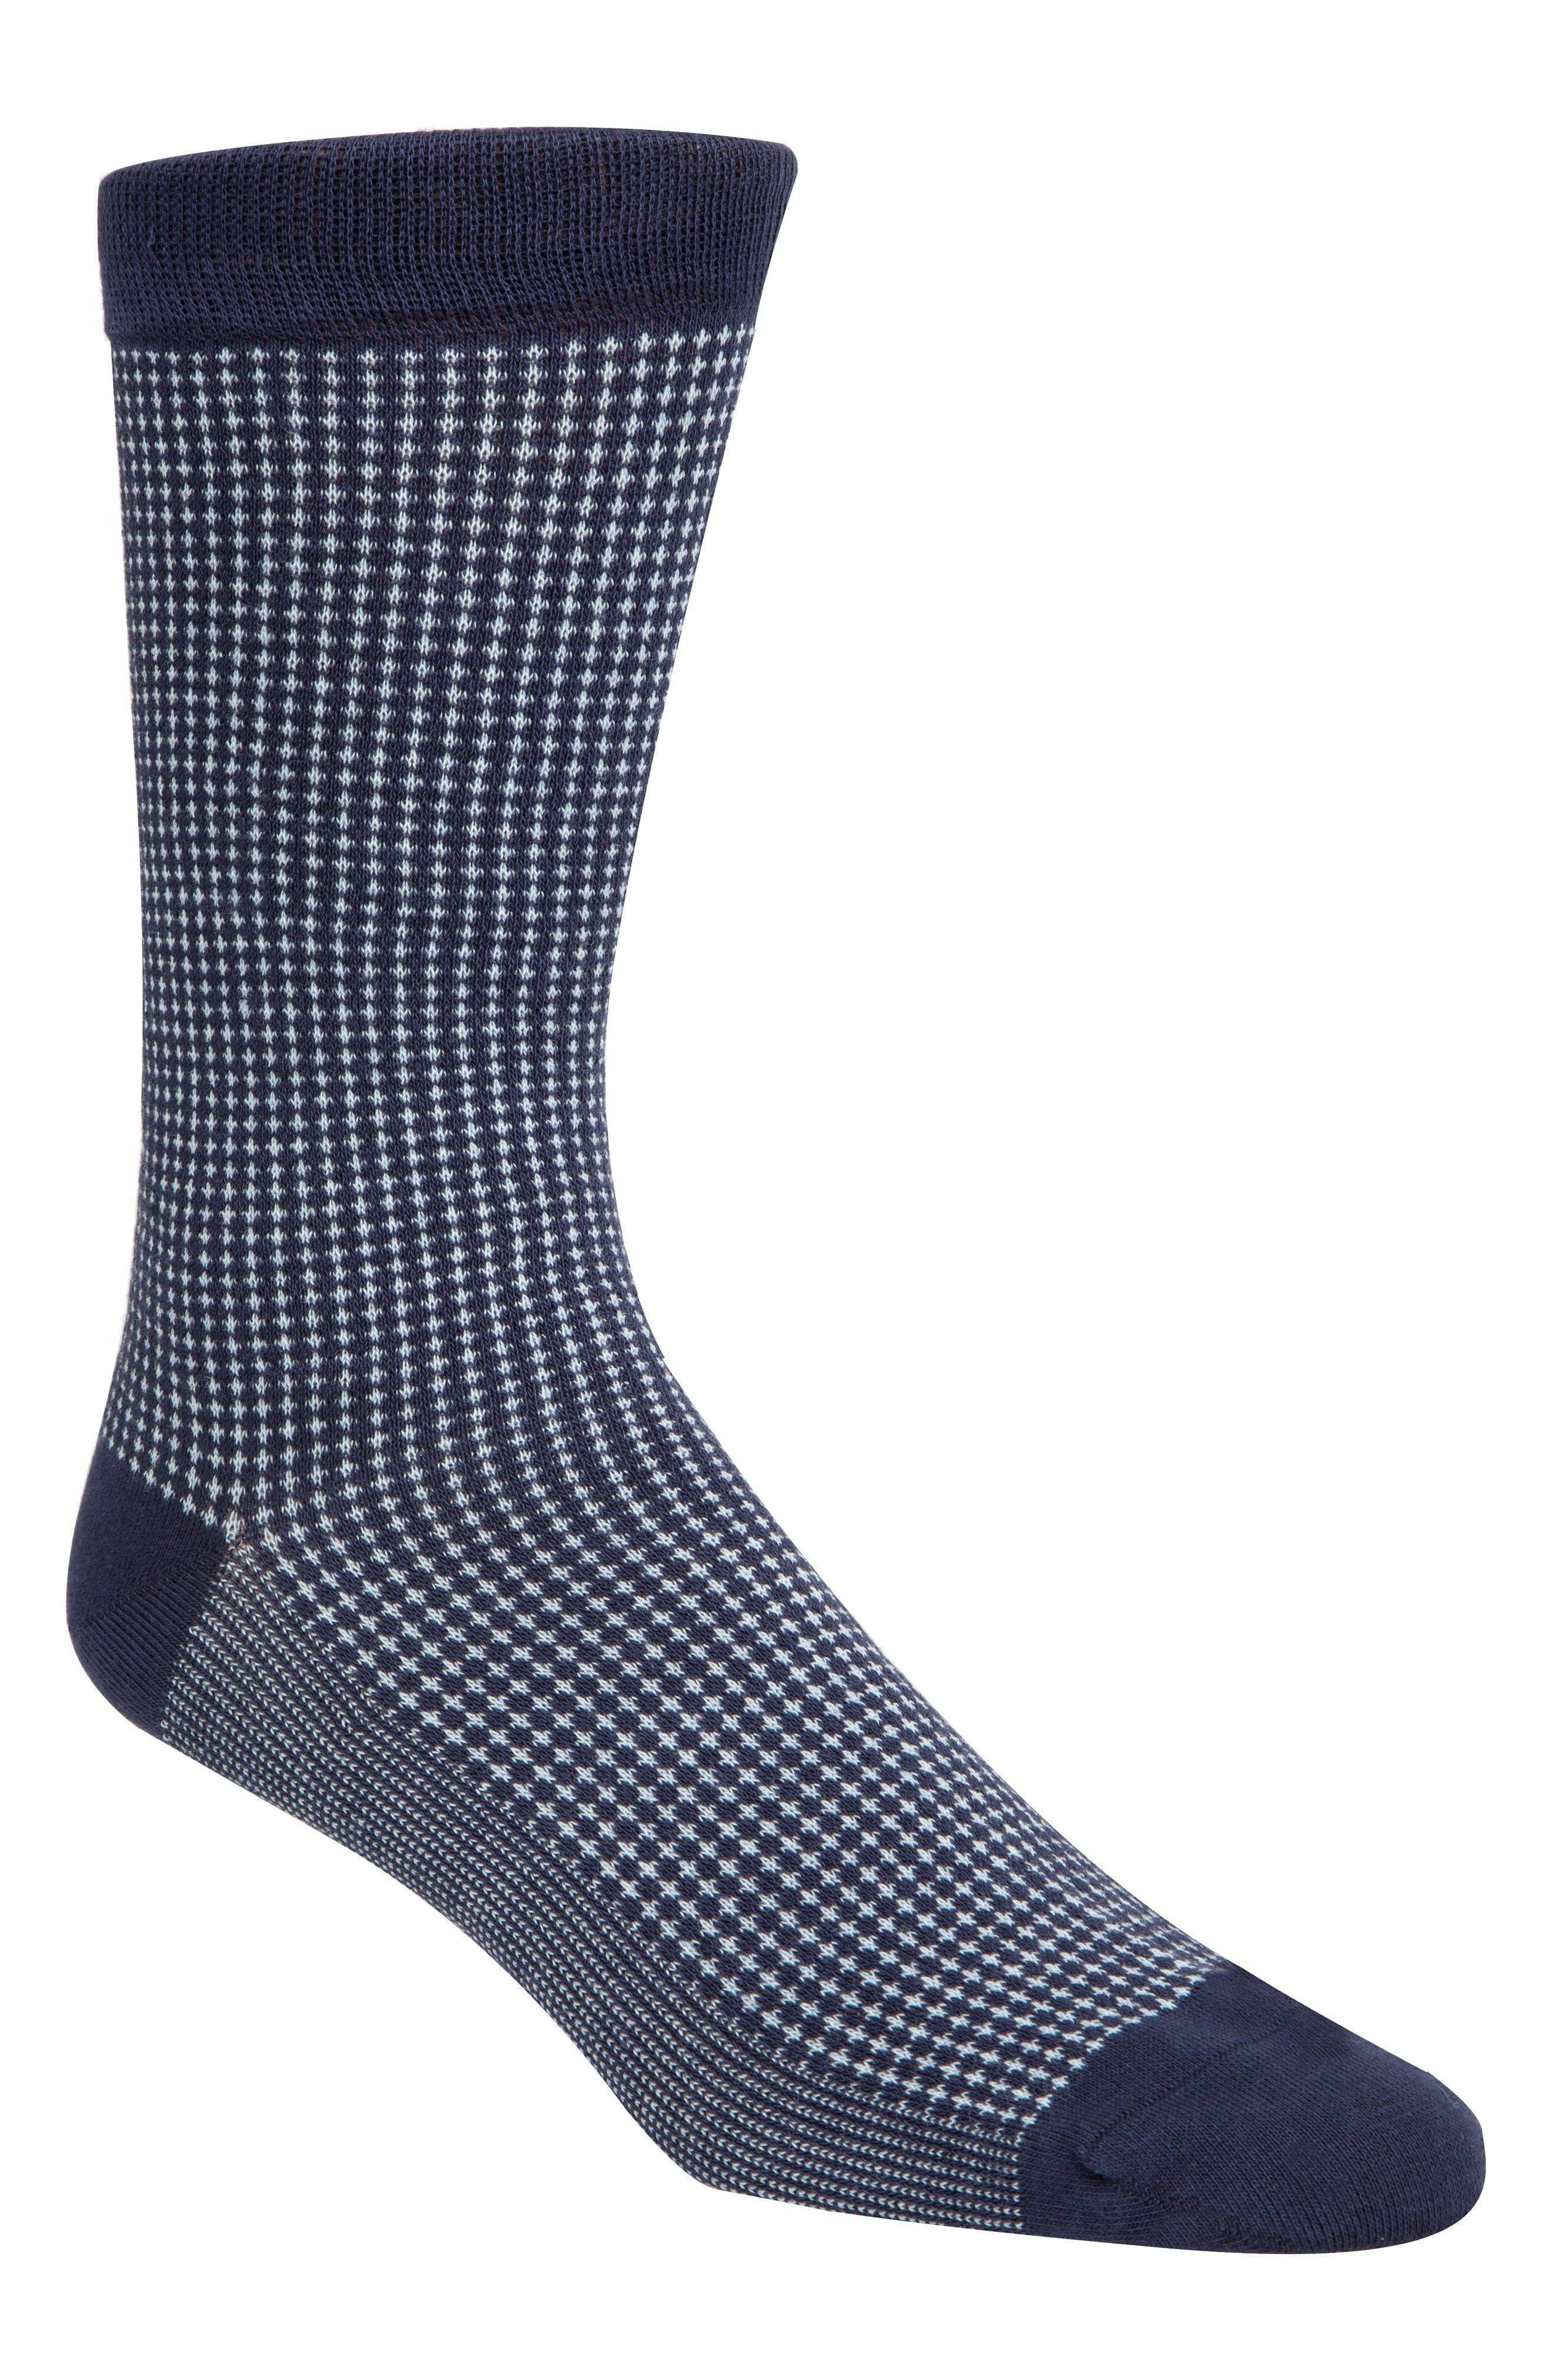 Check Socks,                             Main thumbnail 1, color,                             Marine Blue